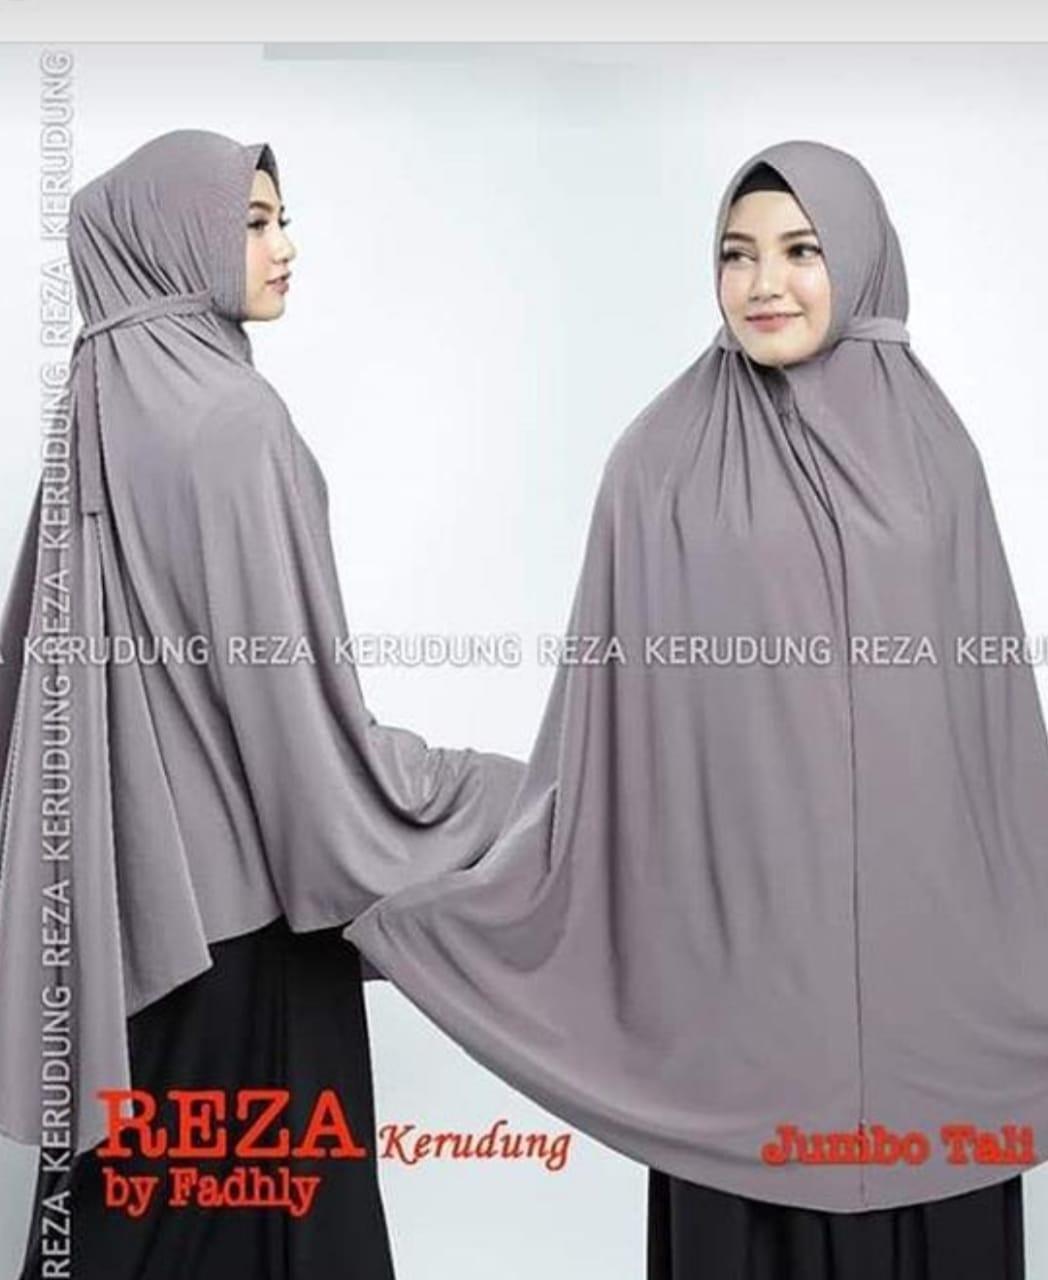 Salmi Scraf - Hijab Syar'i Jersy Reza Tali JUMBO / Hijab Instan / Hijab Syar'i terbaru / Jilbab Syar'i / Fashion Wanita Murah / Kerudung Wanita